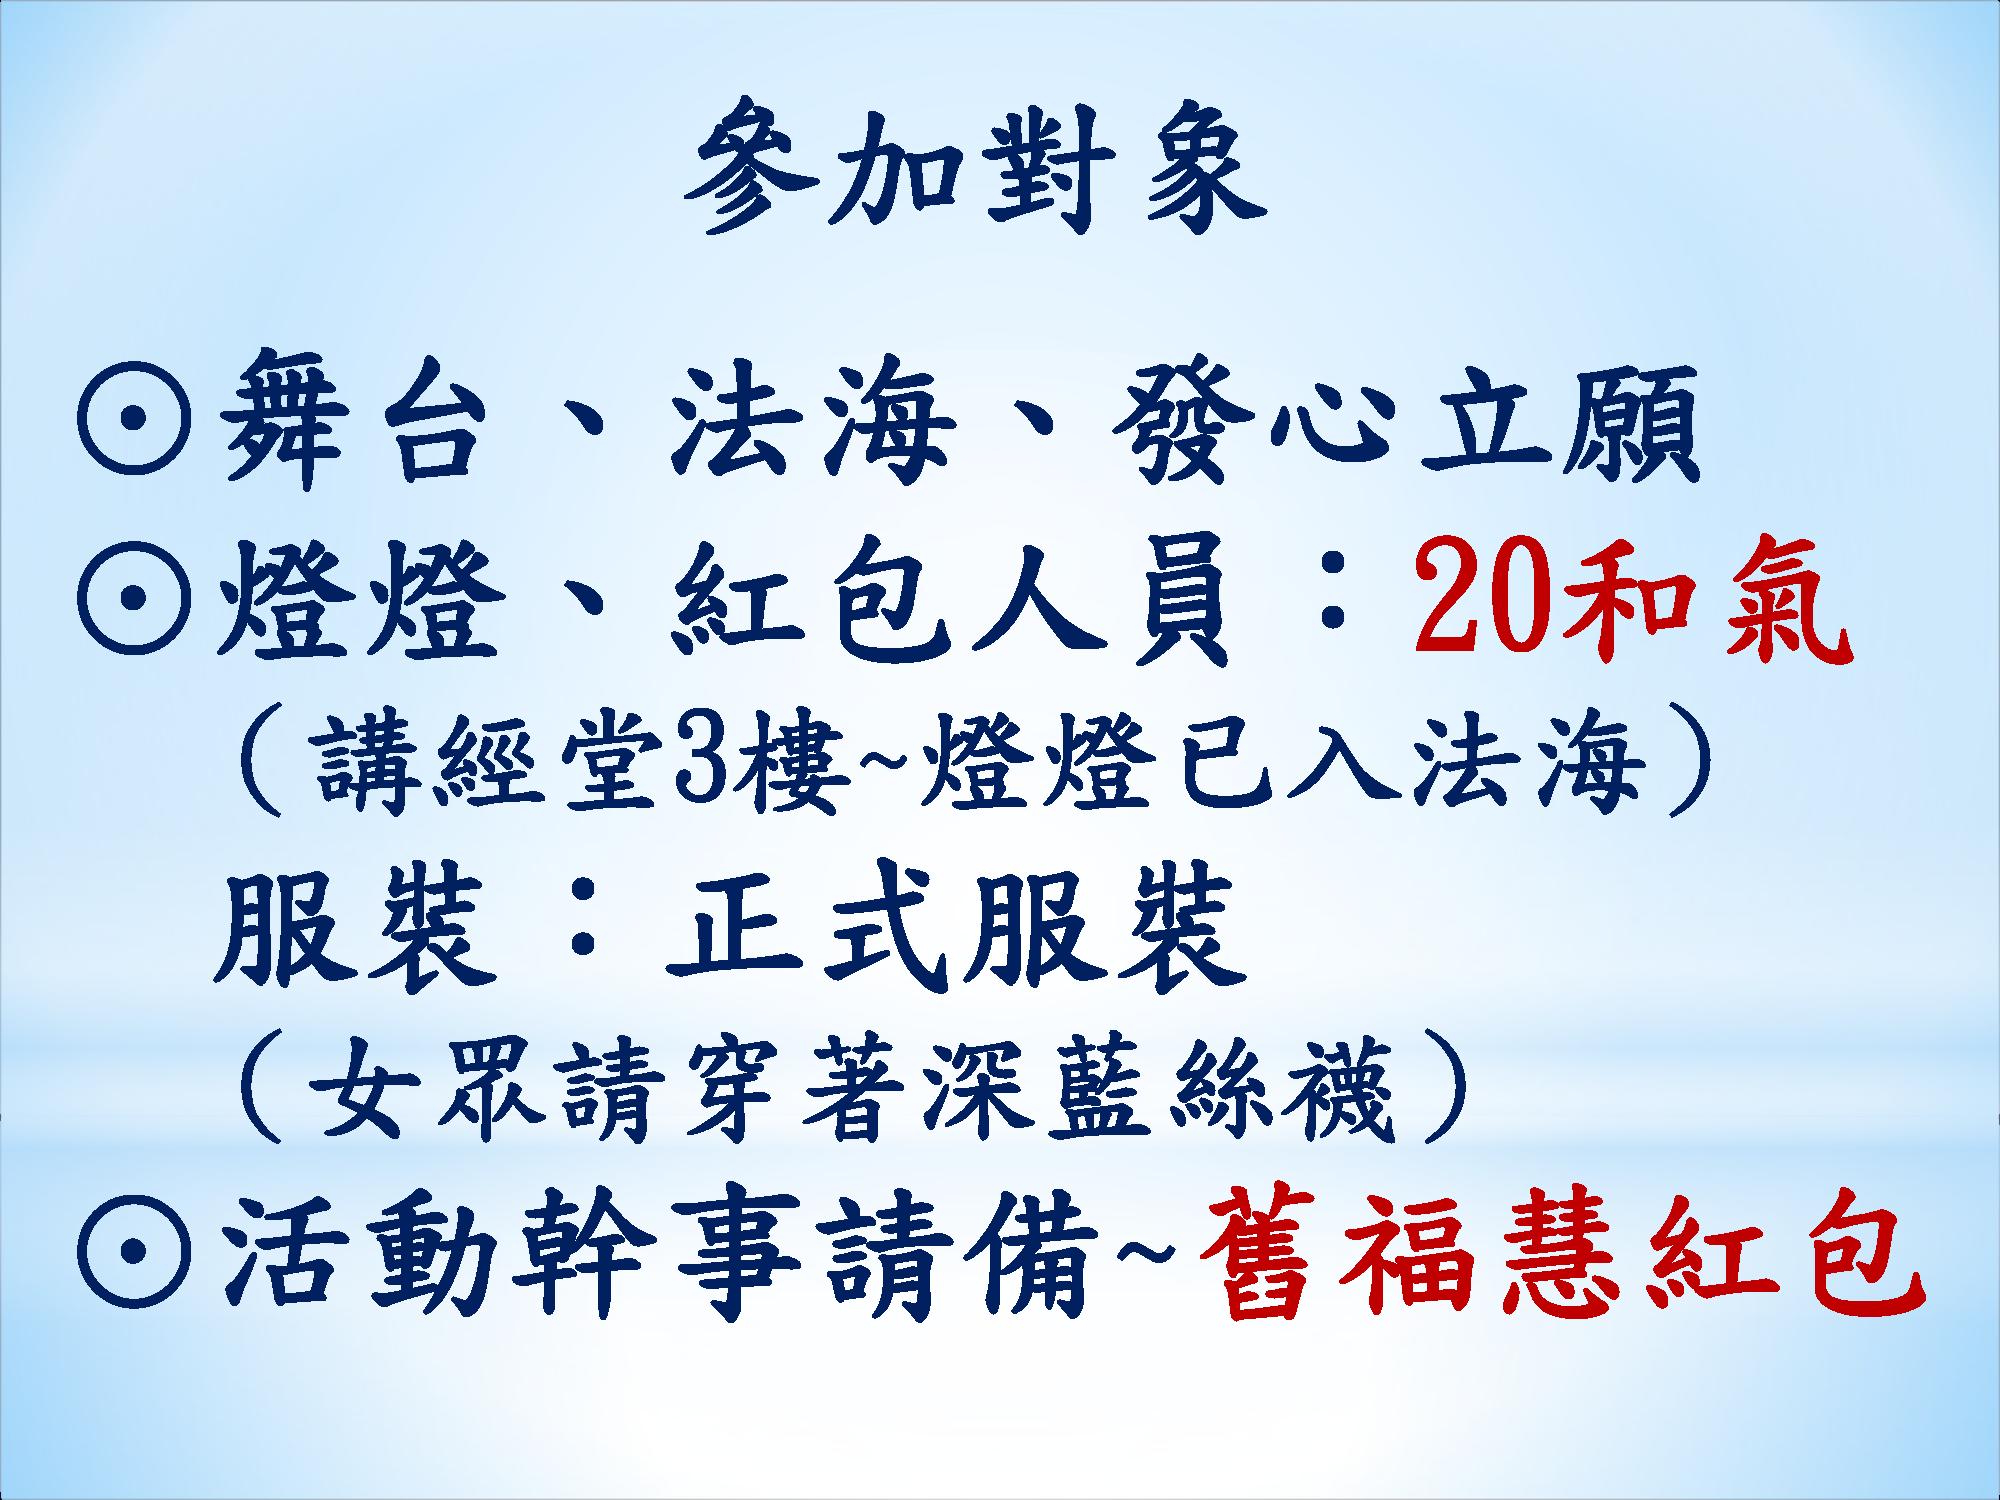 總彩排_頁面_2.png